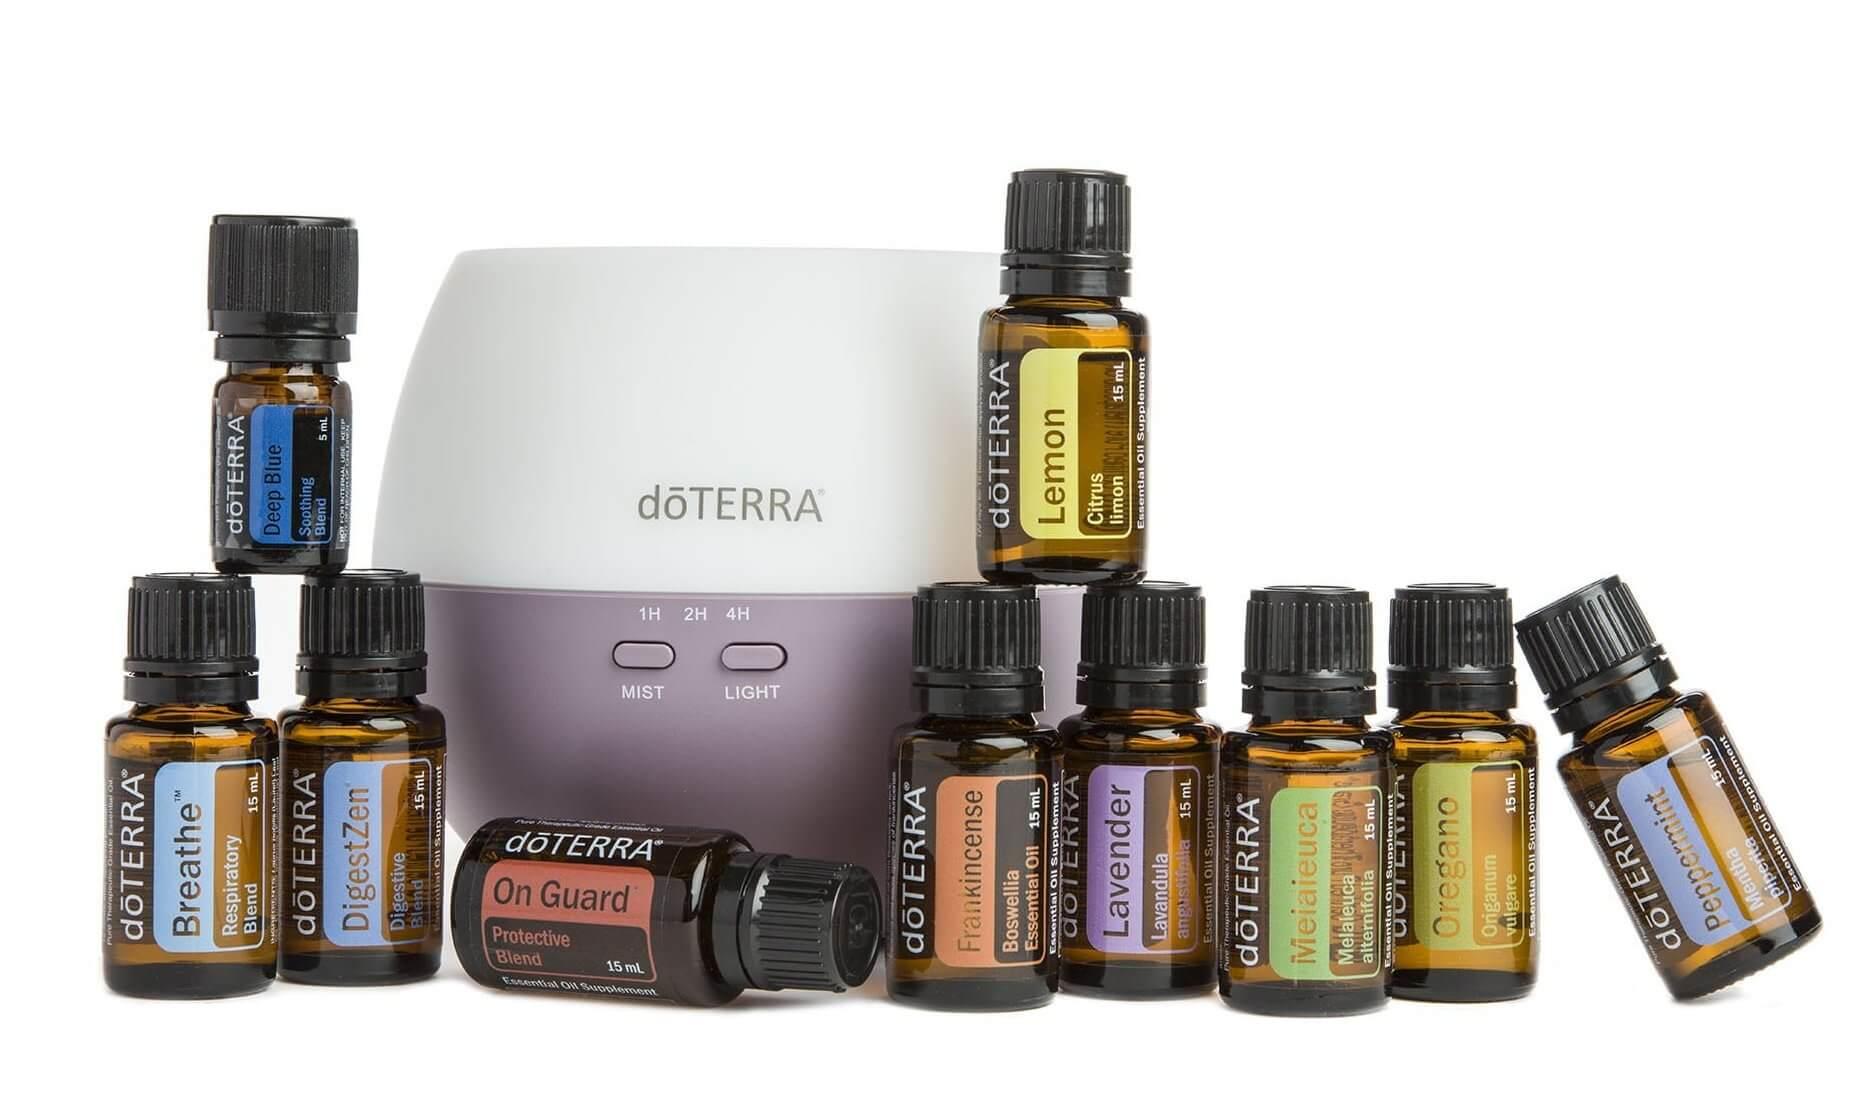 doterra home essentials kit